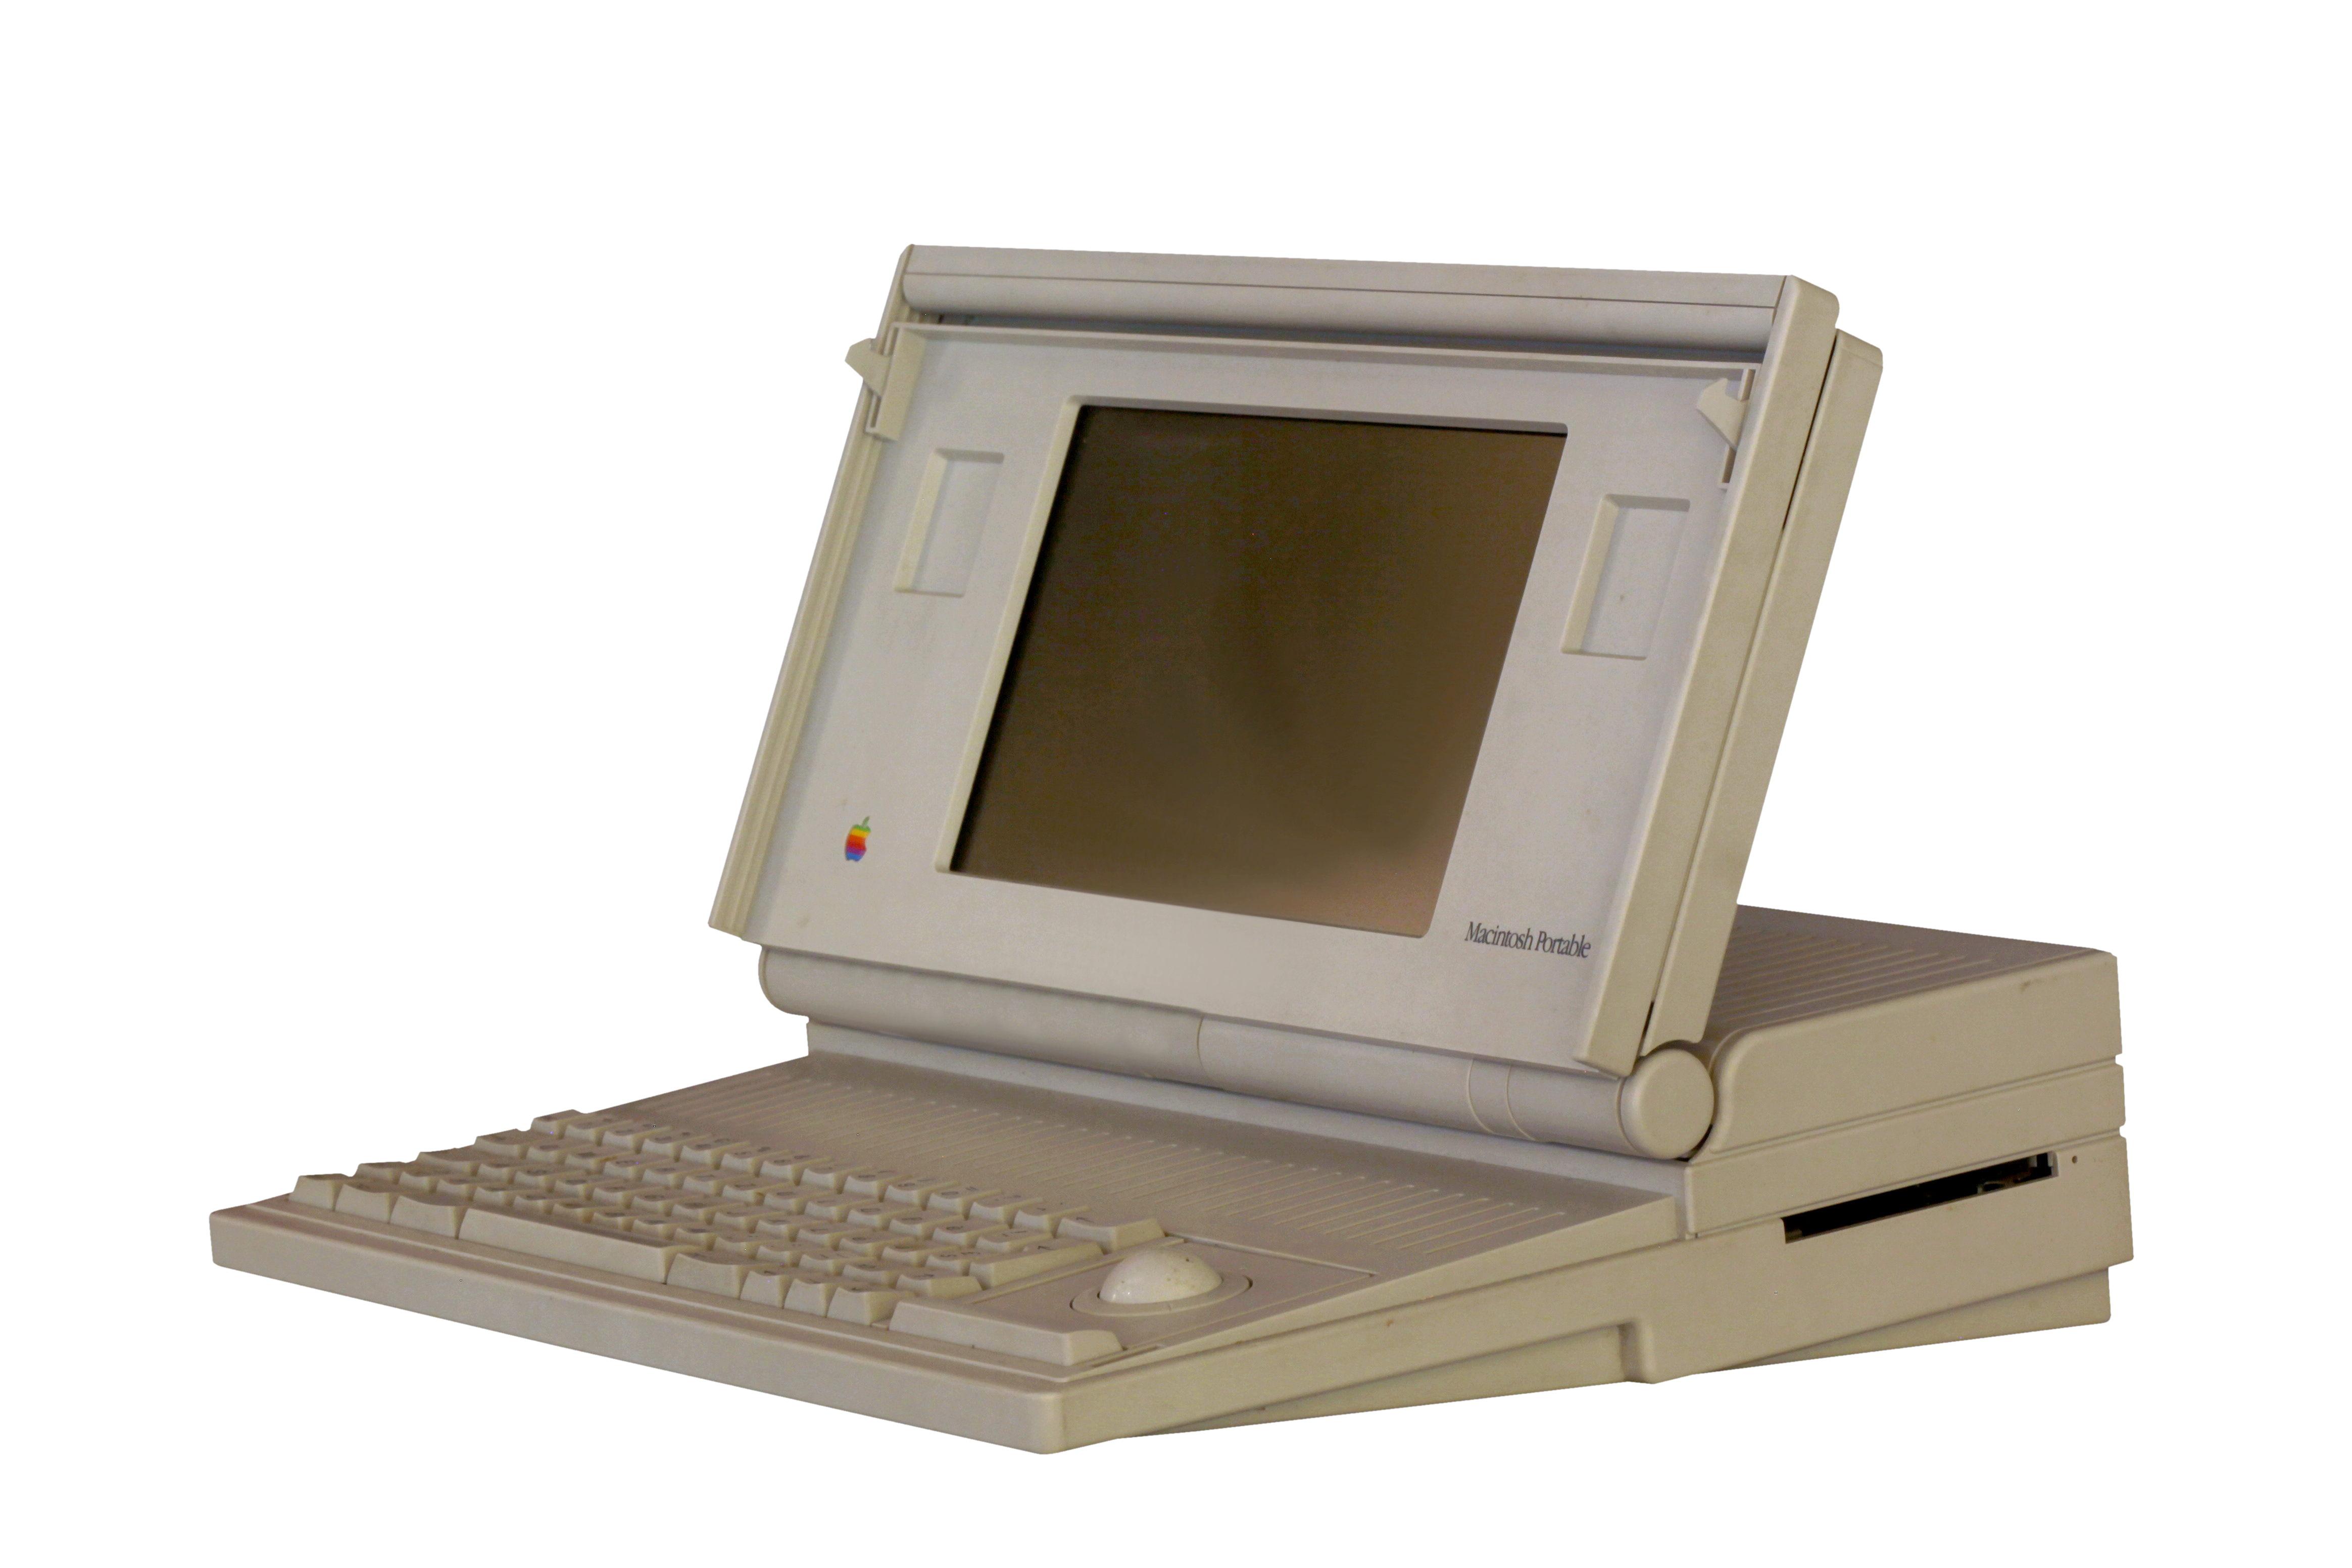 HQ Macintosh Wallpapers | File 715.55Kb